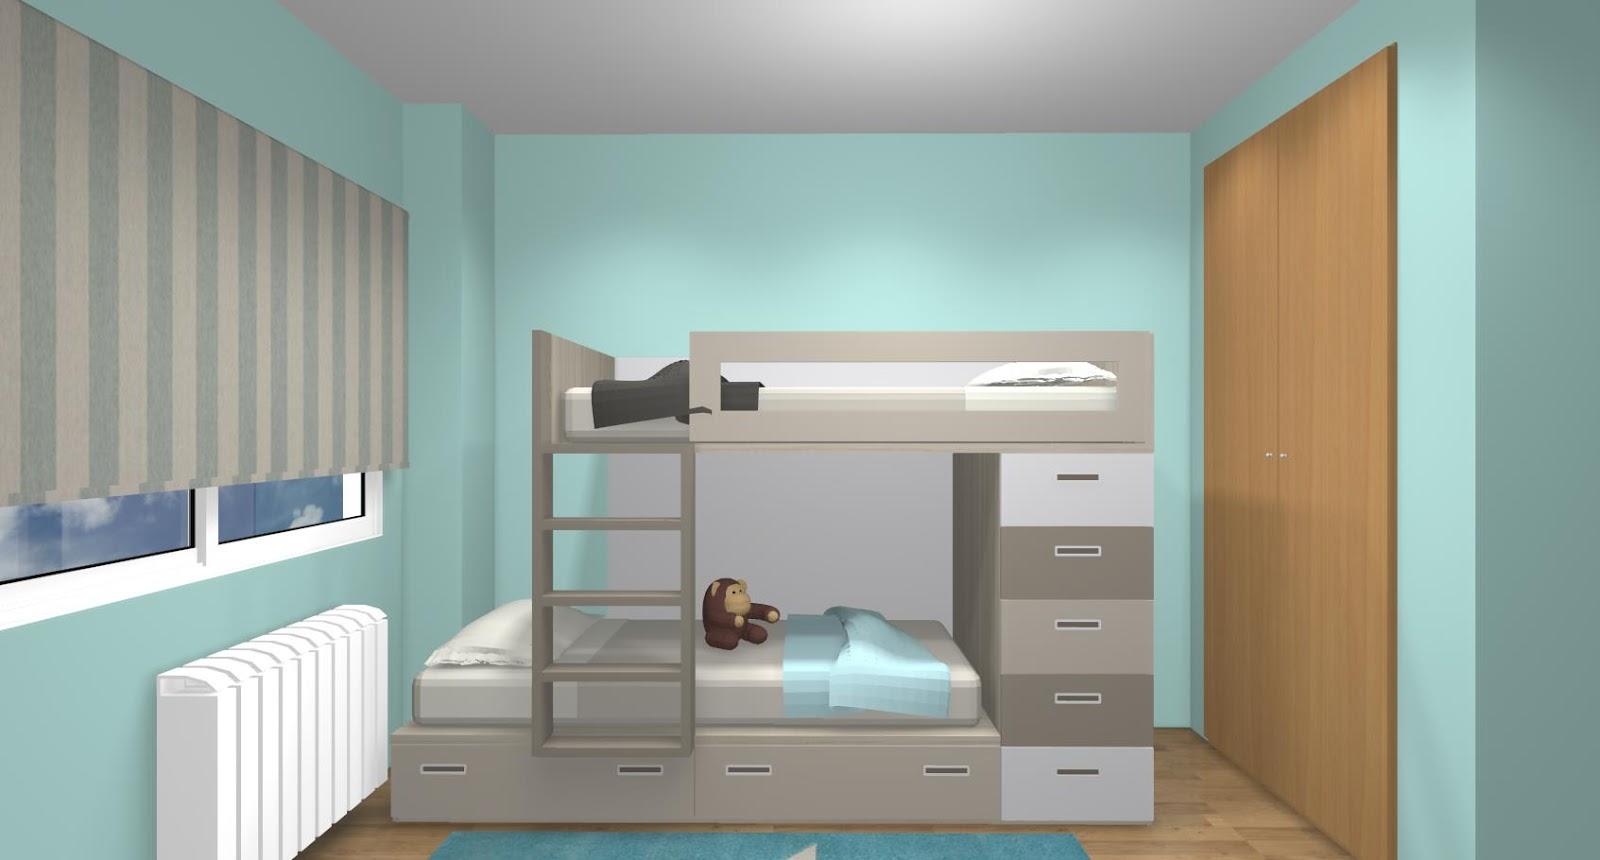 Dormitorios juveniles a medida en madrid for Roperos para dormitorios juveniles